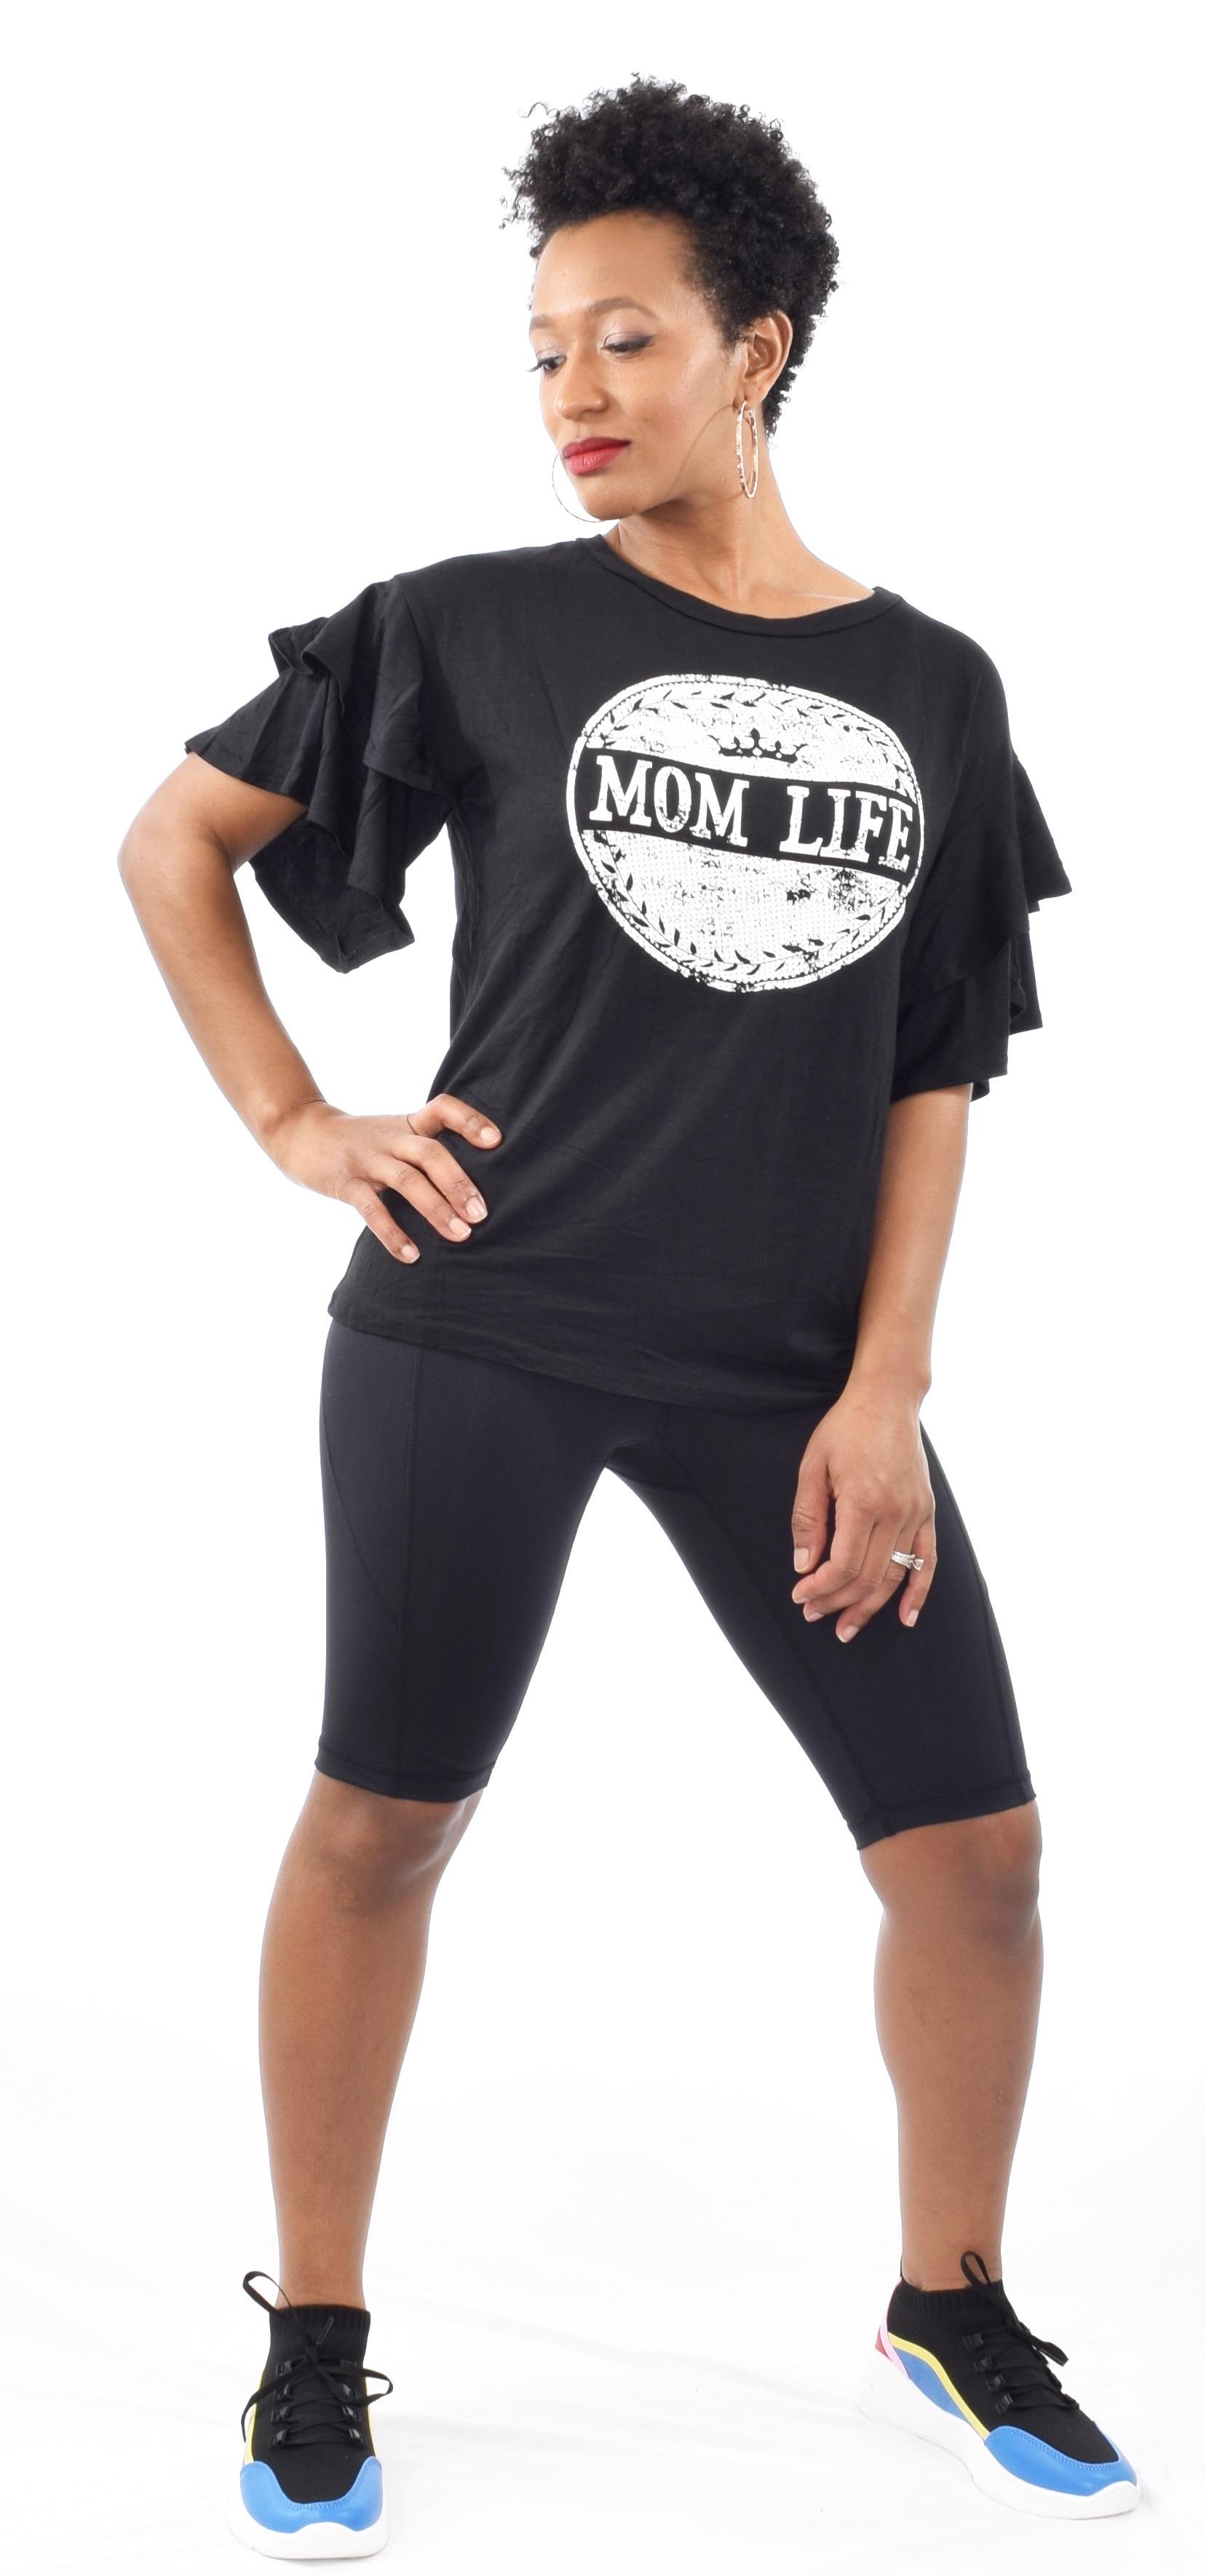 """Mom Life"" Ruffle Sleeve T-Shirt - $15"